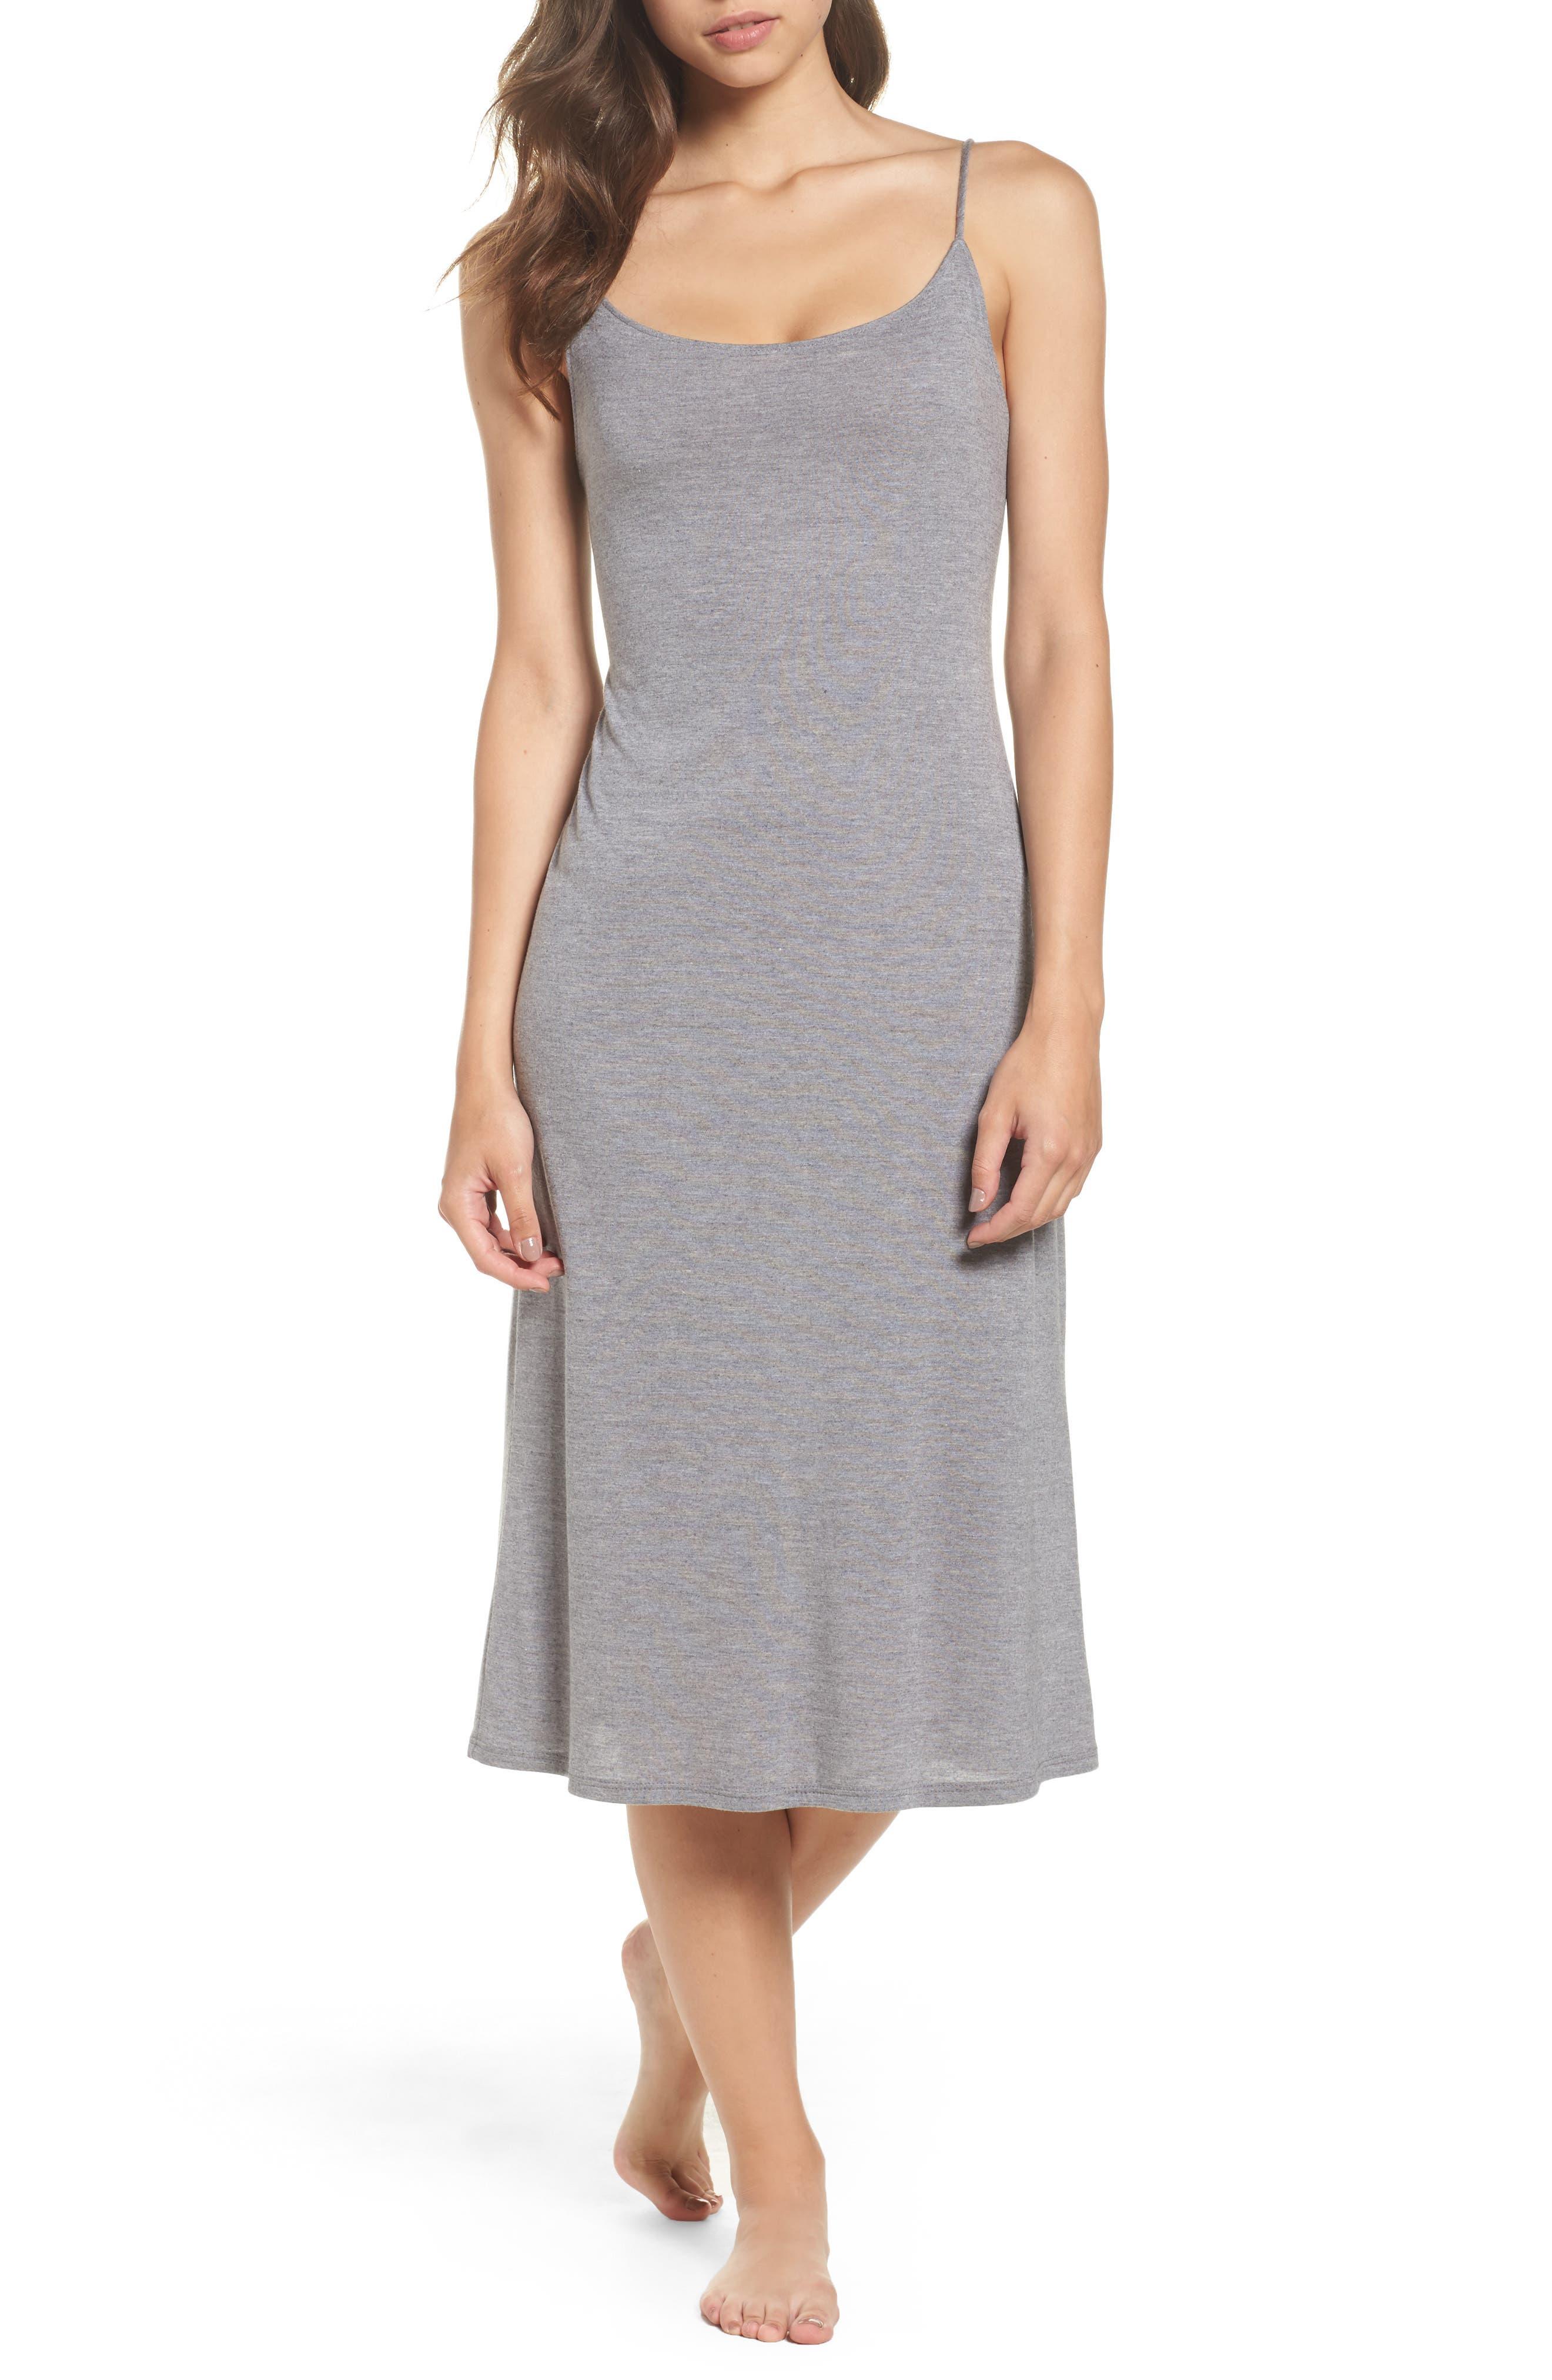 Natori Shangri La Nightgown, Grey